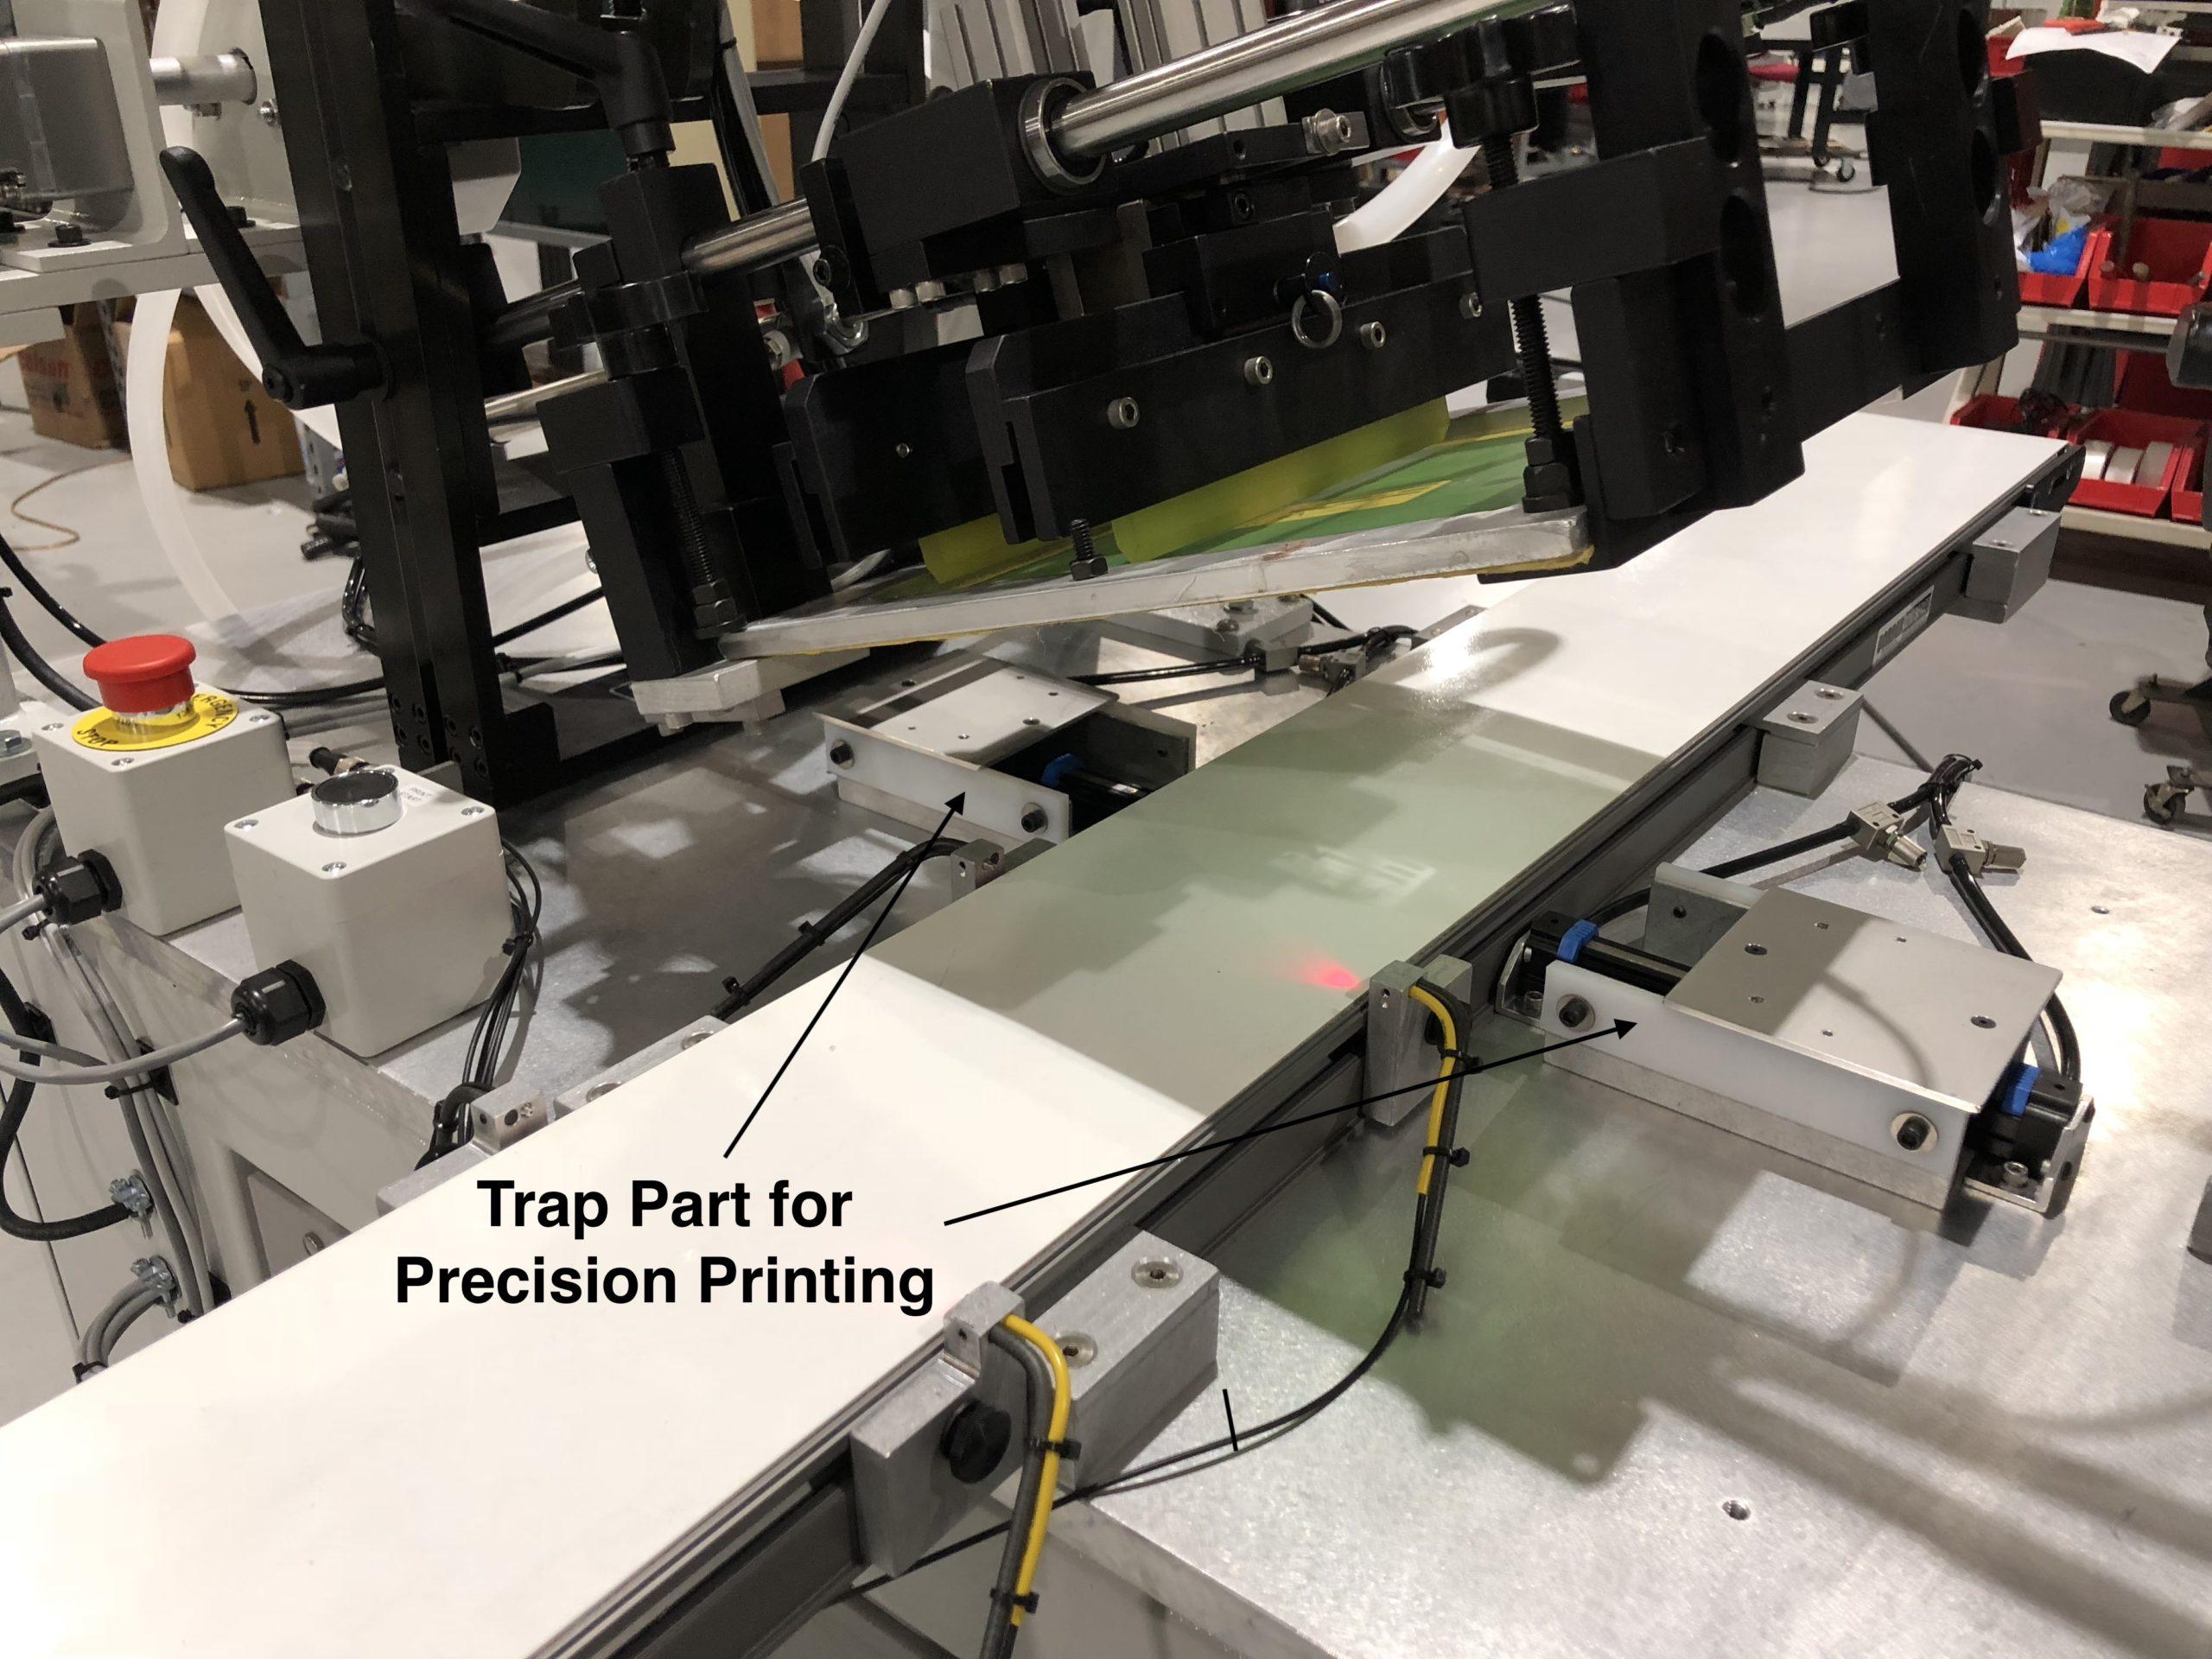 belt print, screen printer, screen printing machine, conveyor belt printing